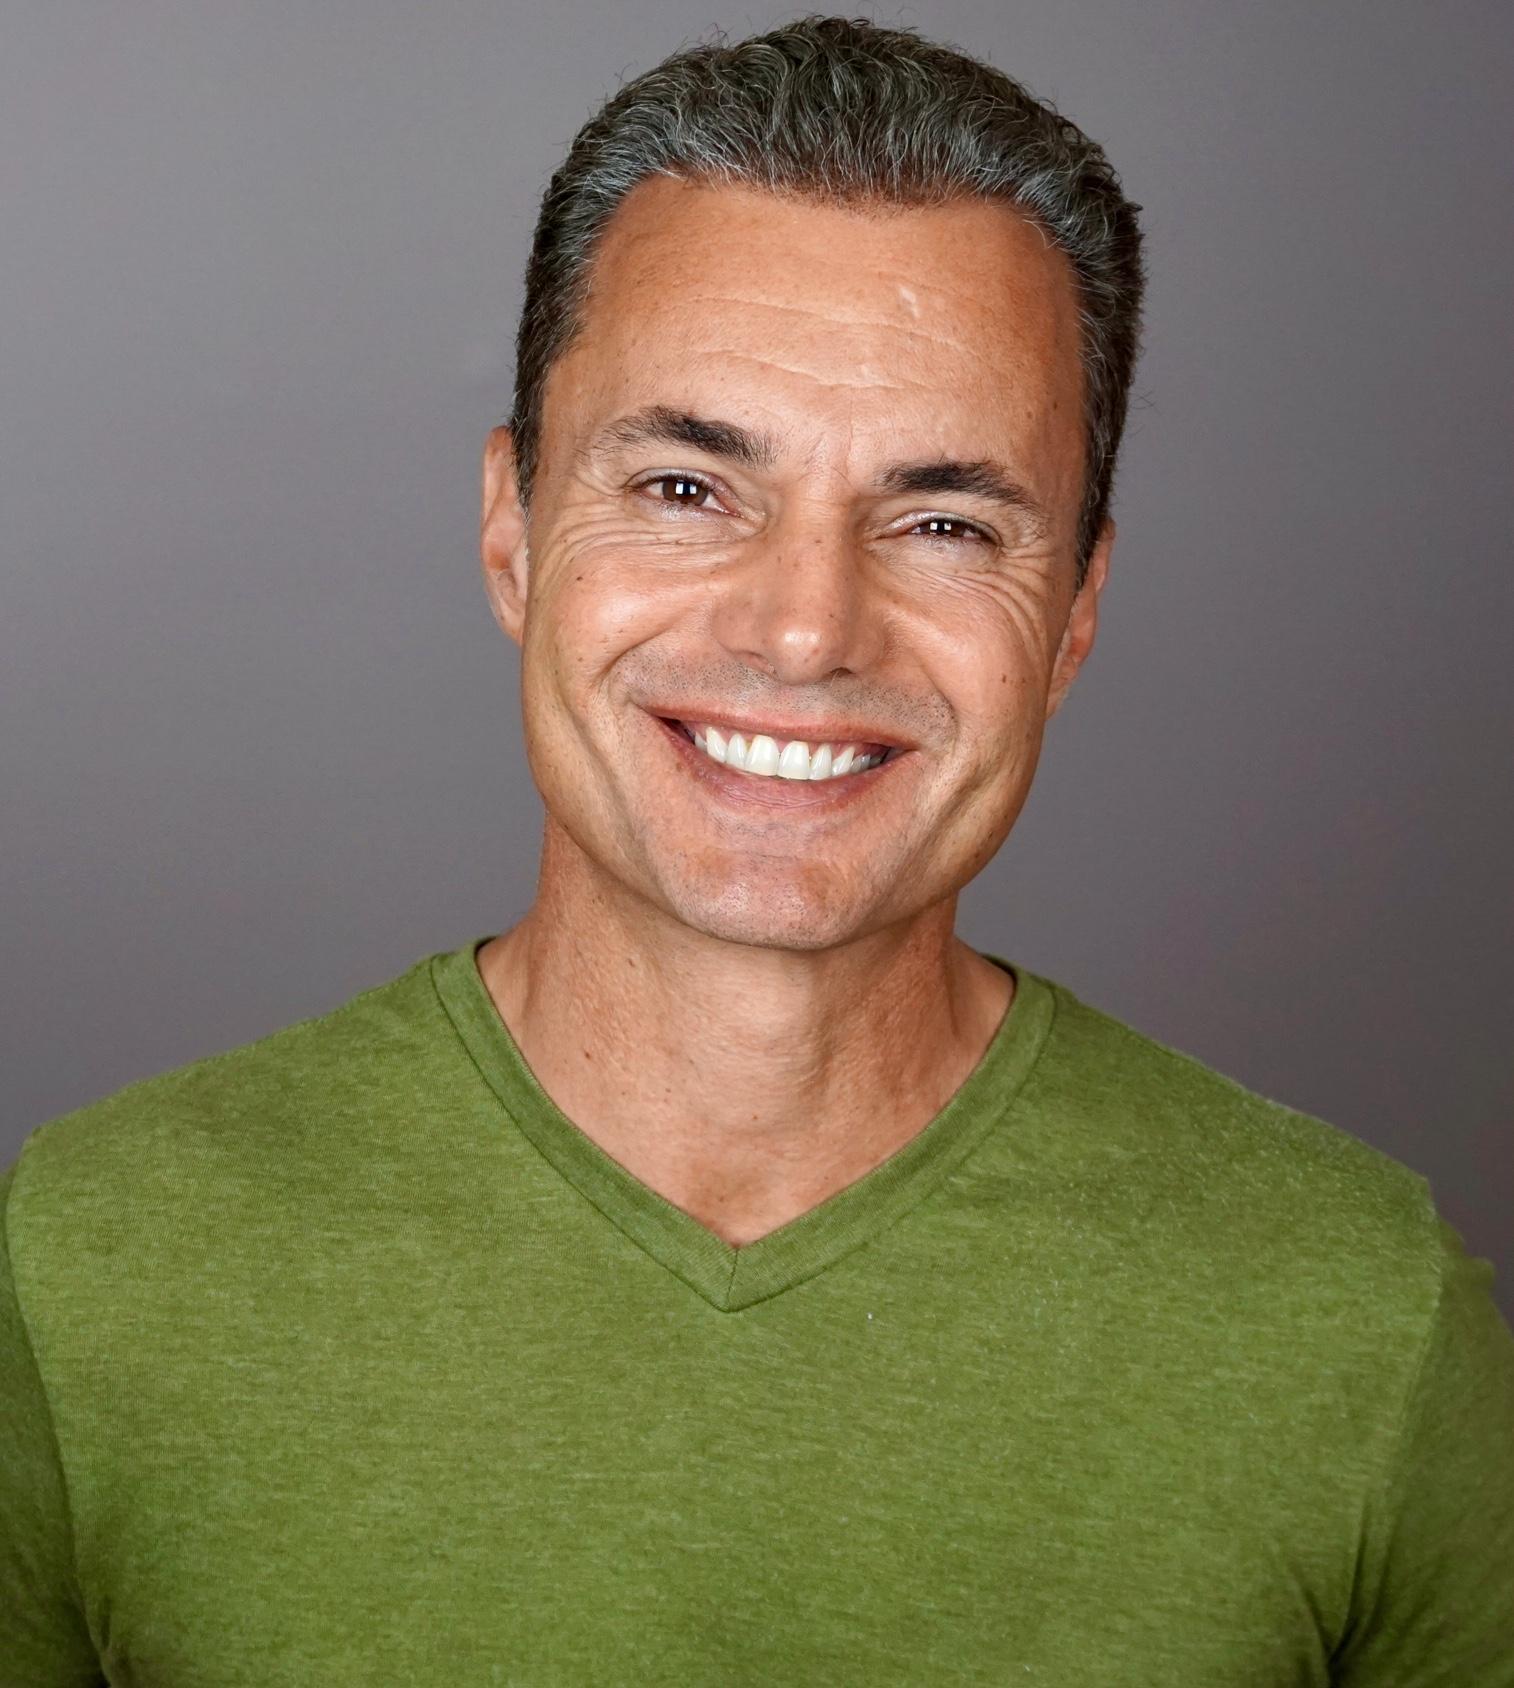 Matt Borlenghi   Health and Life Insurance Agent   Marietta, GA 30068